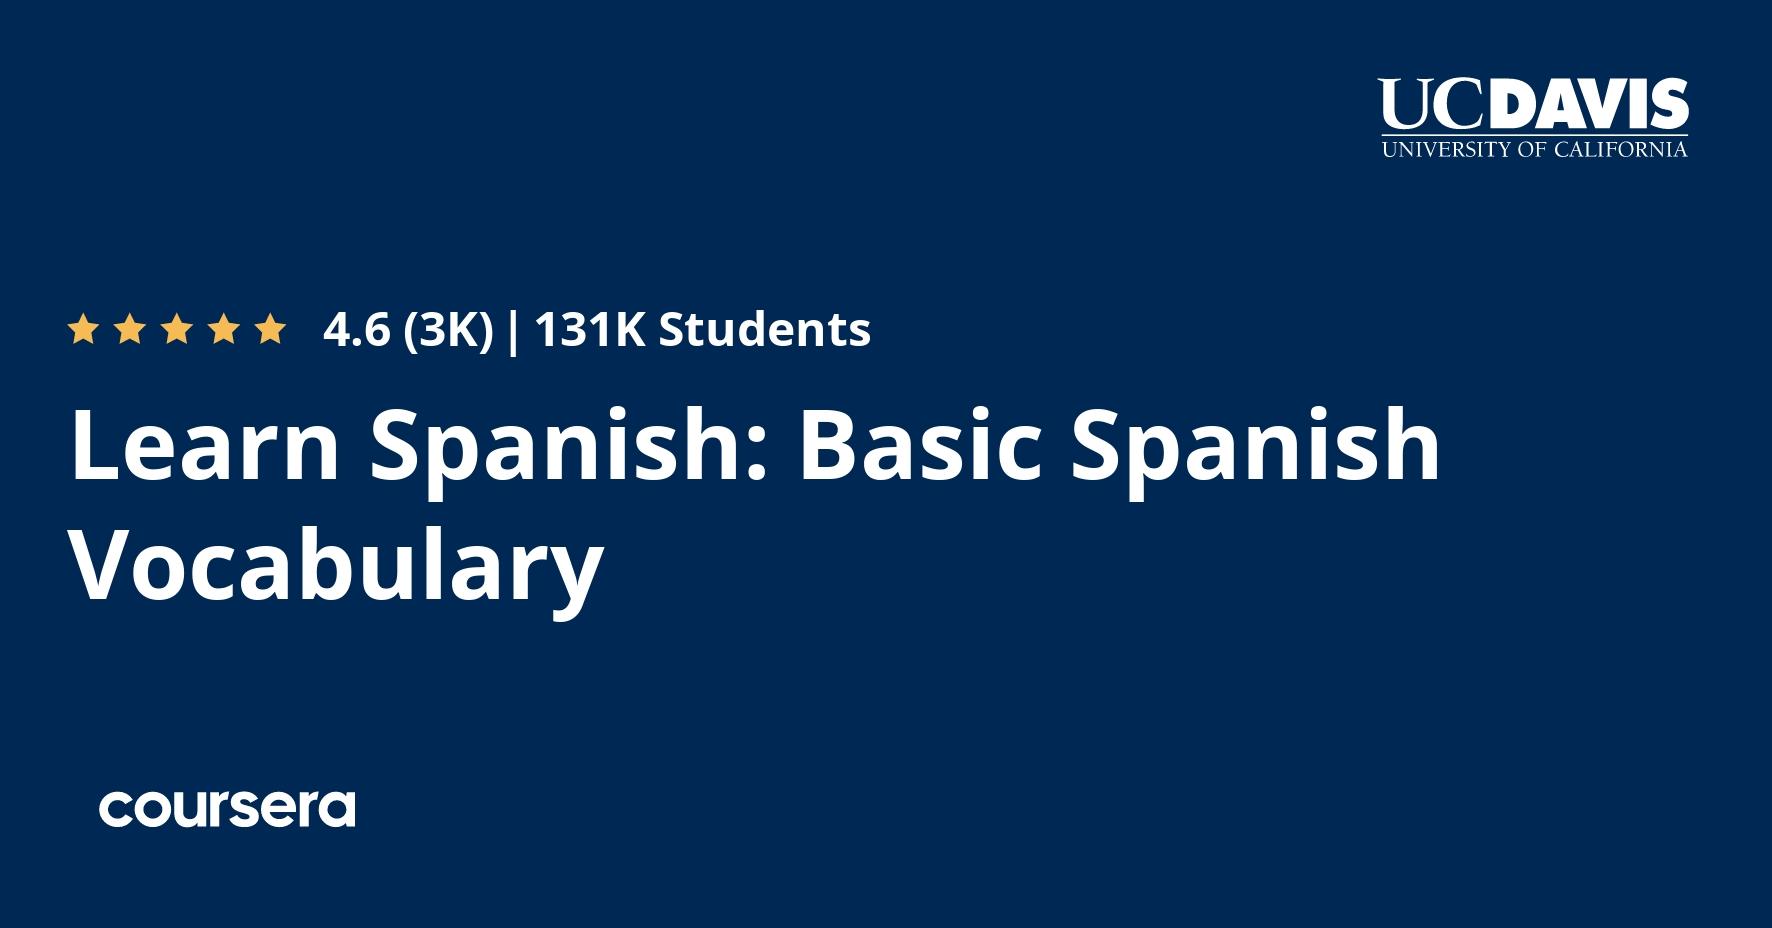 learn spanish basic spanish vocabulary coursera learn spanish basic spanish vocabulary